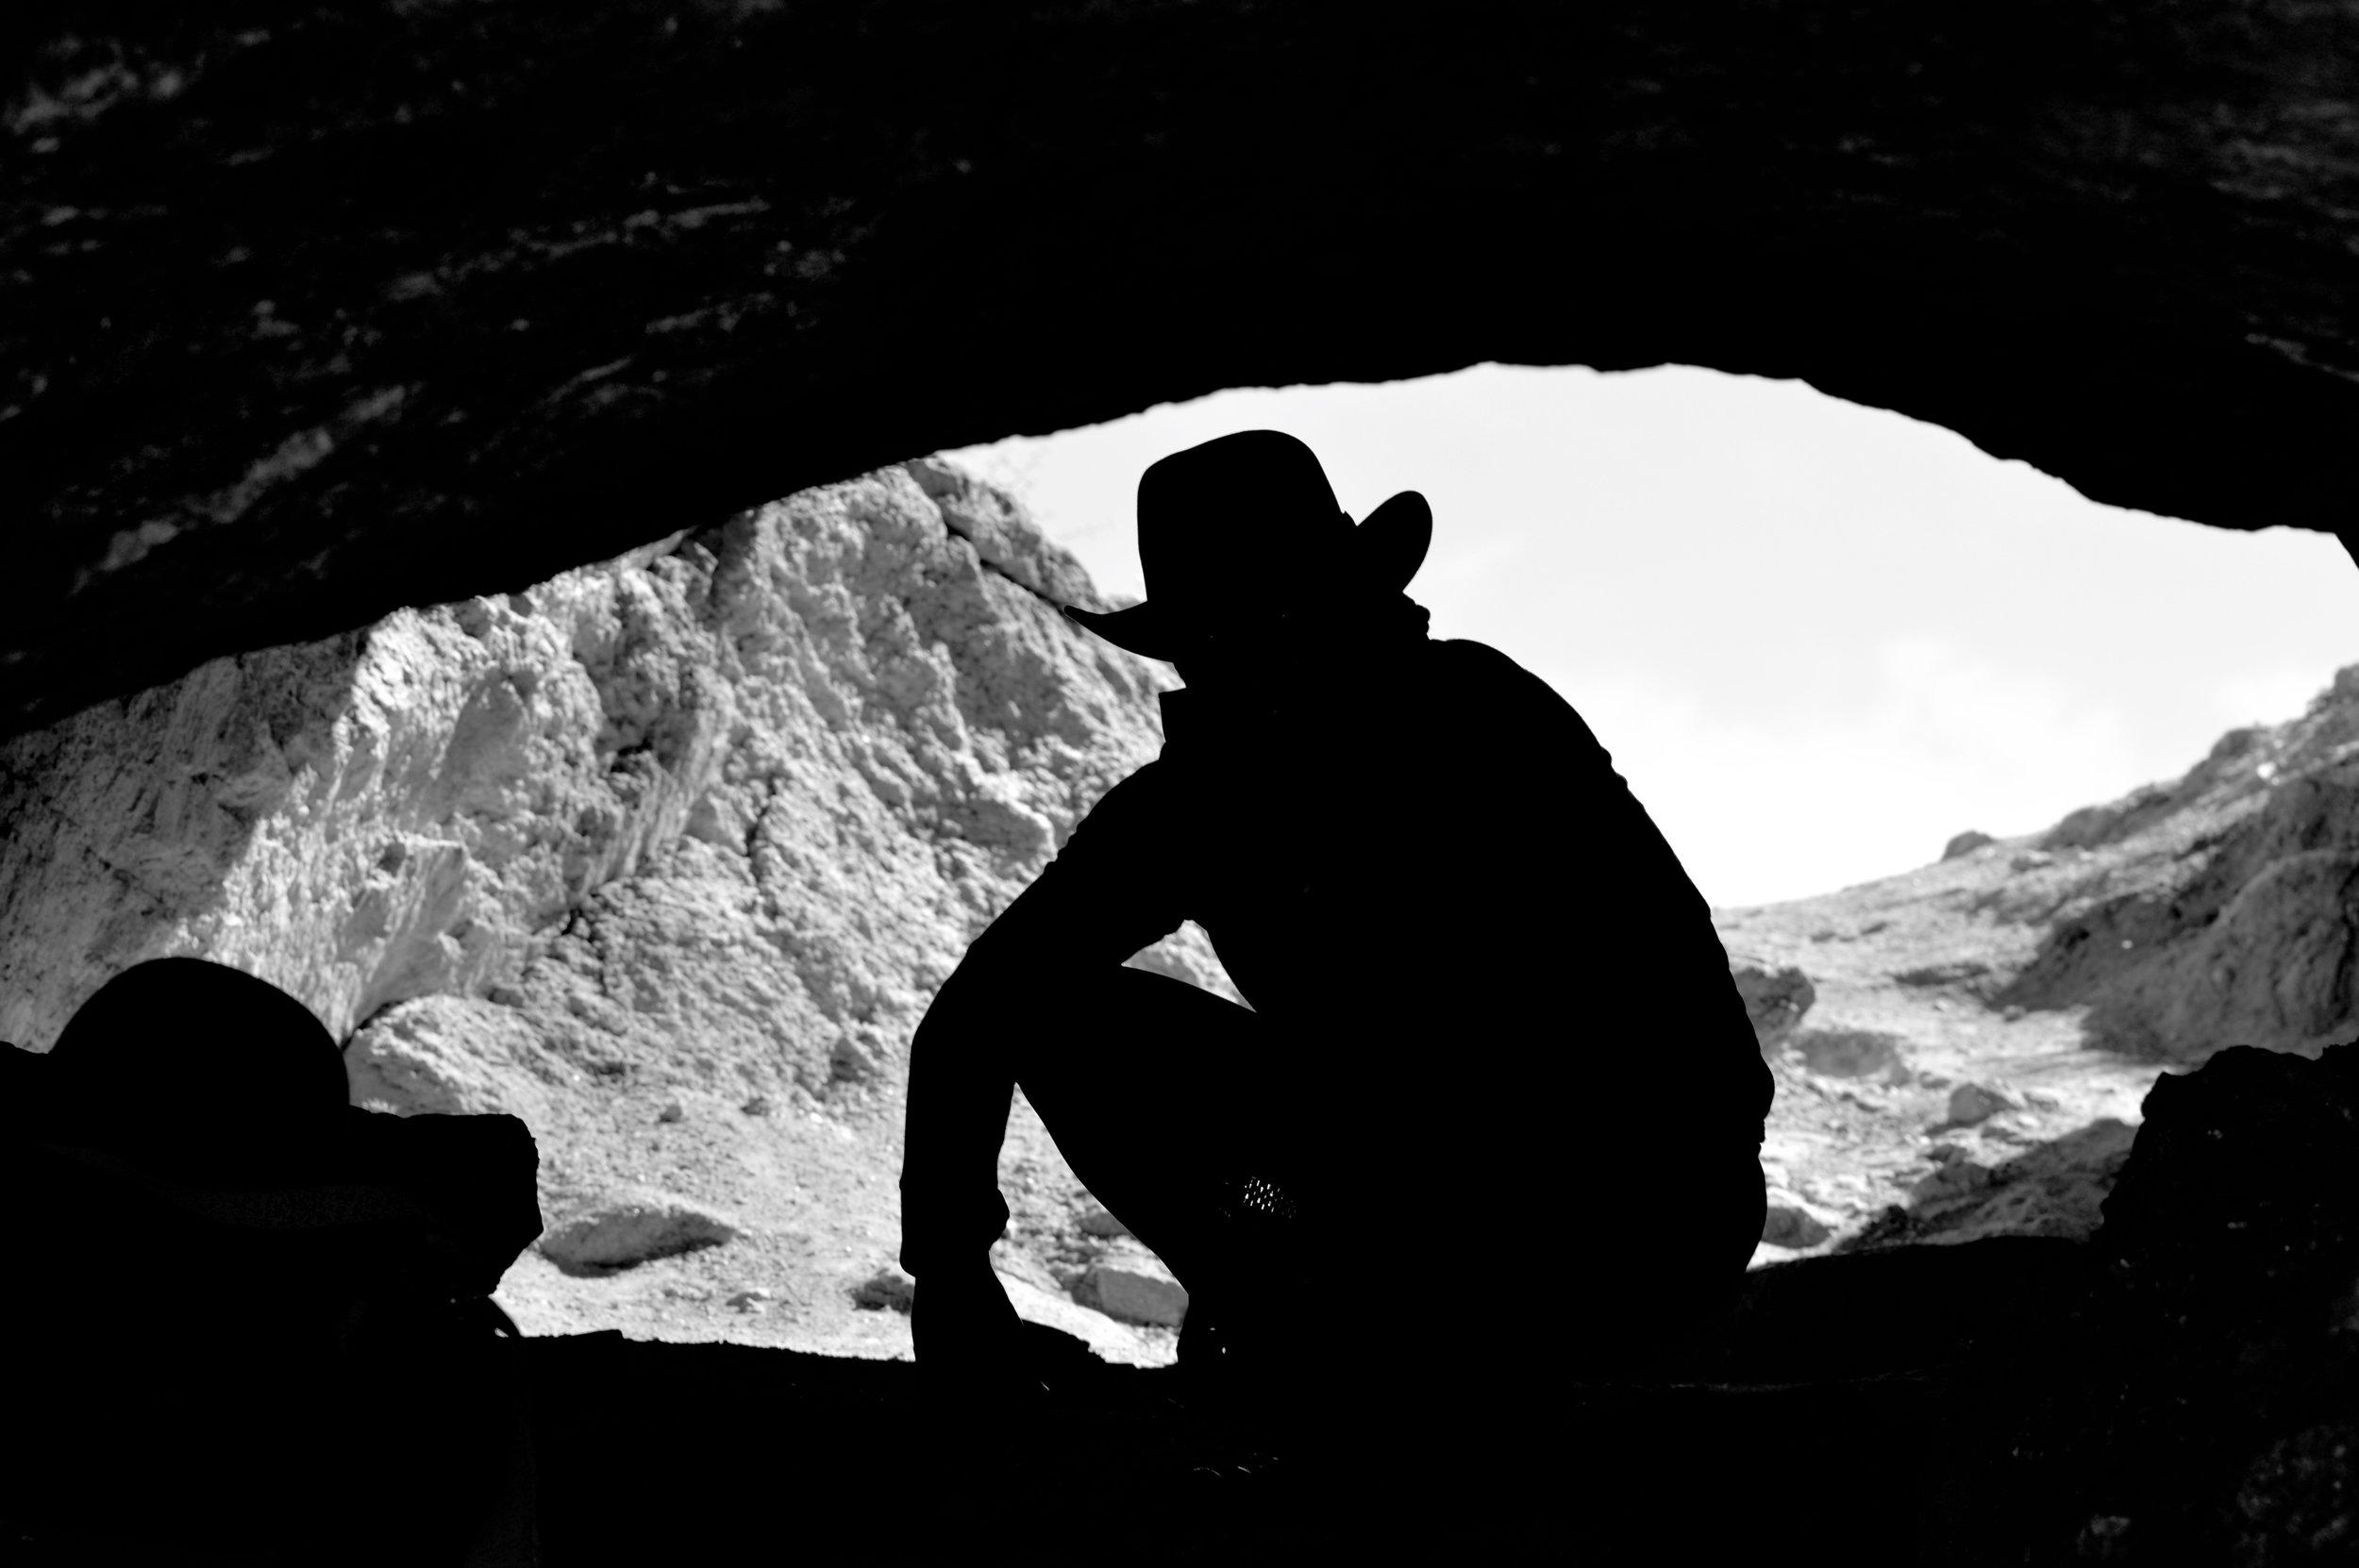 Art crawls inside the cave